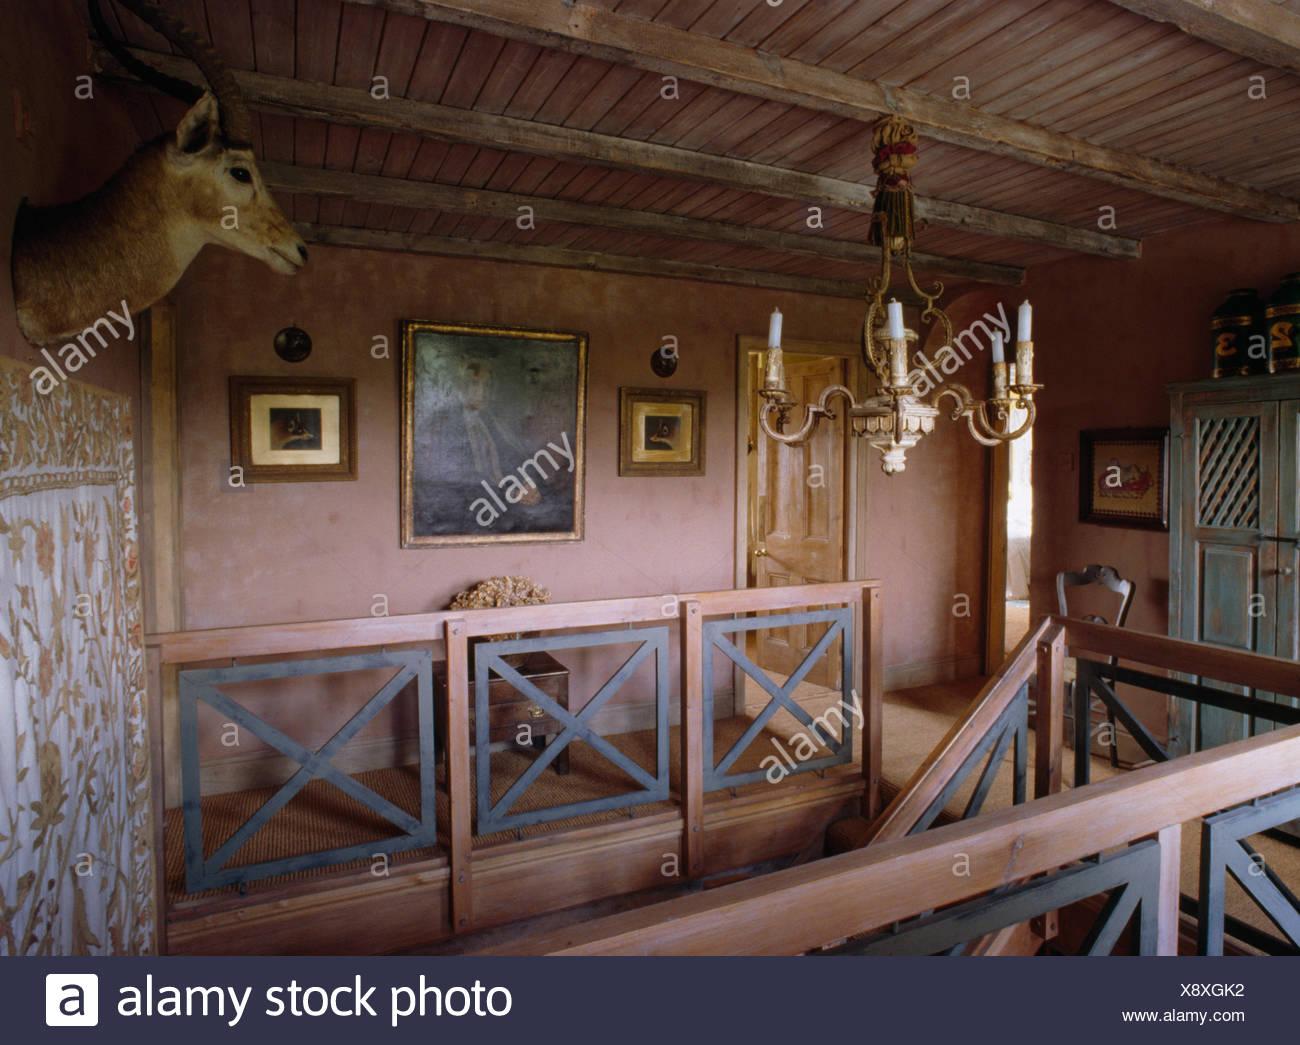 Plafoniere Esterno Su Palu : Lampadario su legno architettura foto gratis